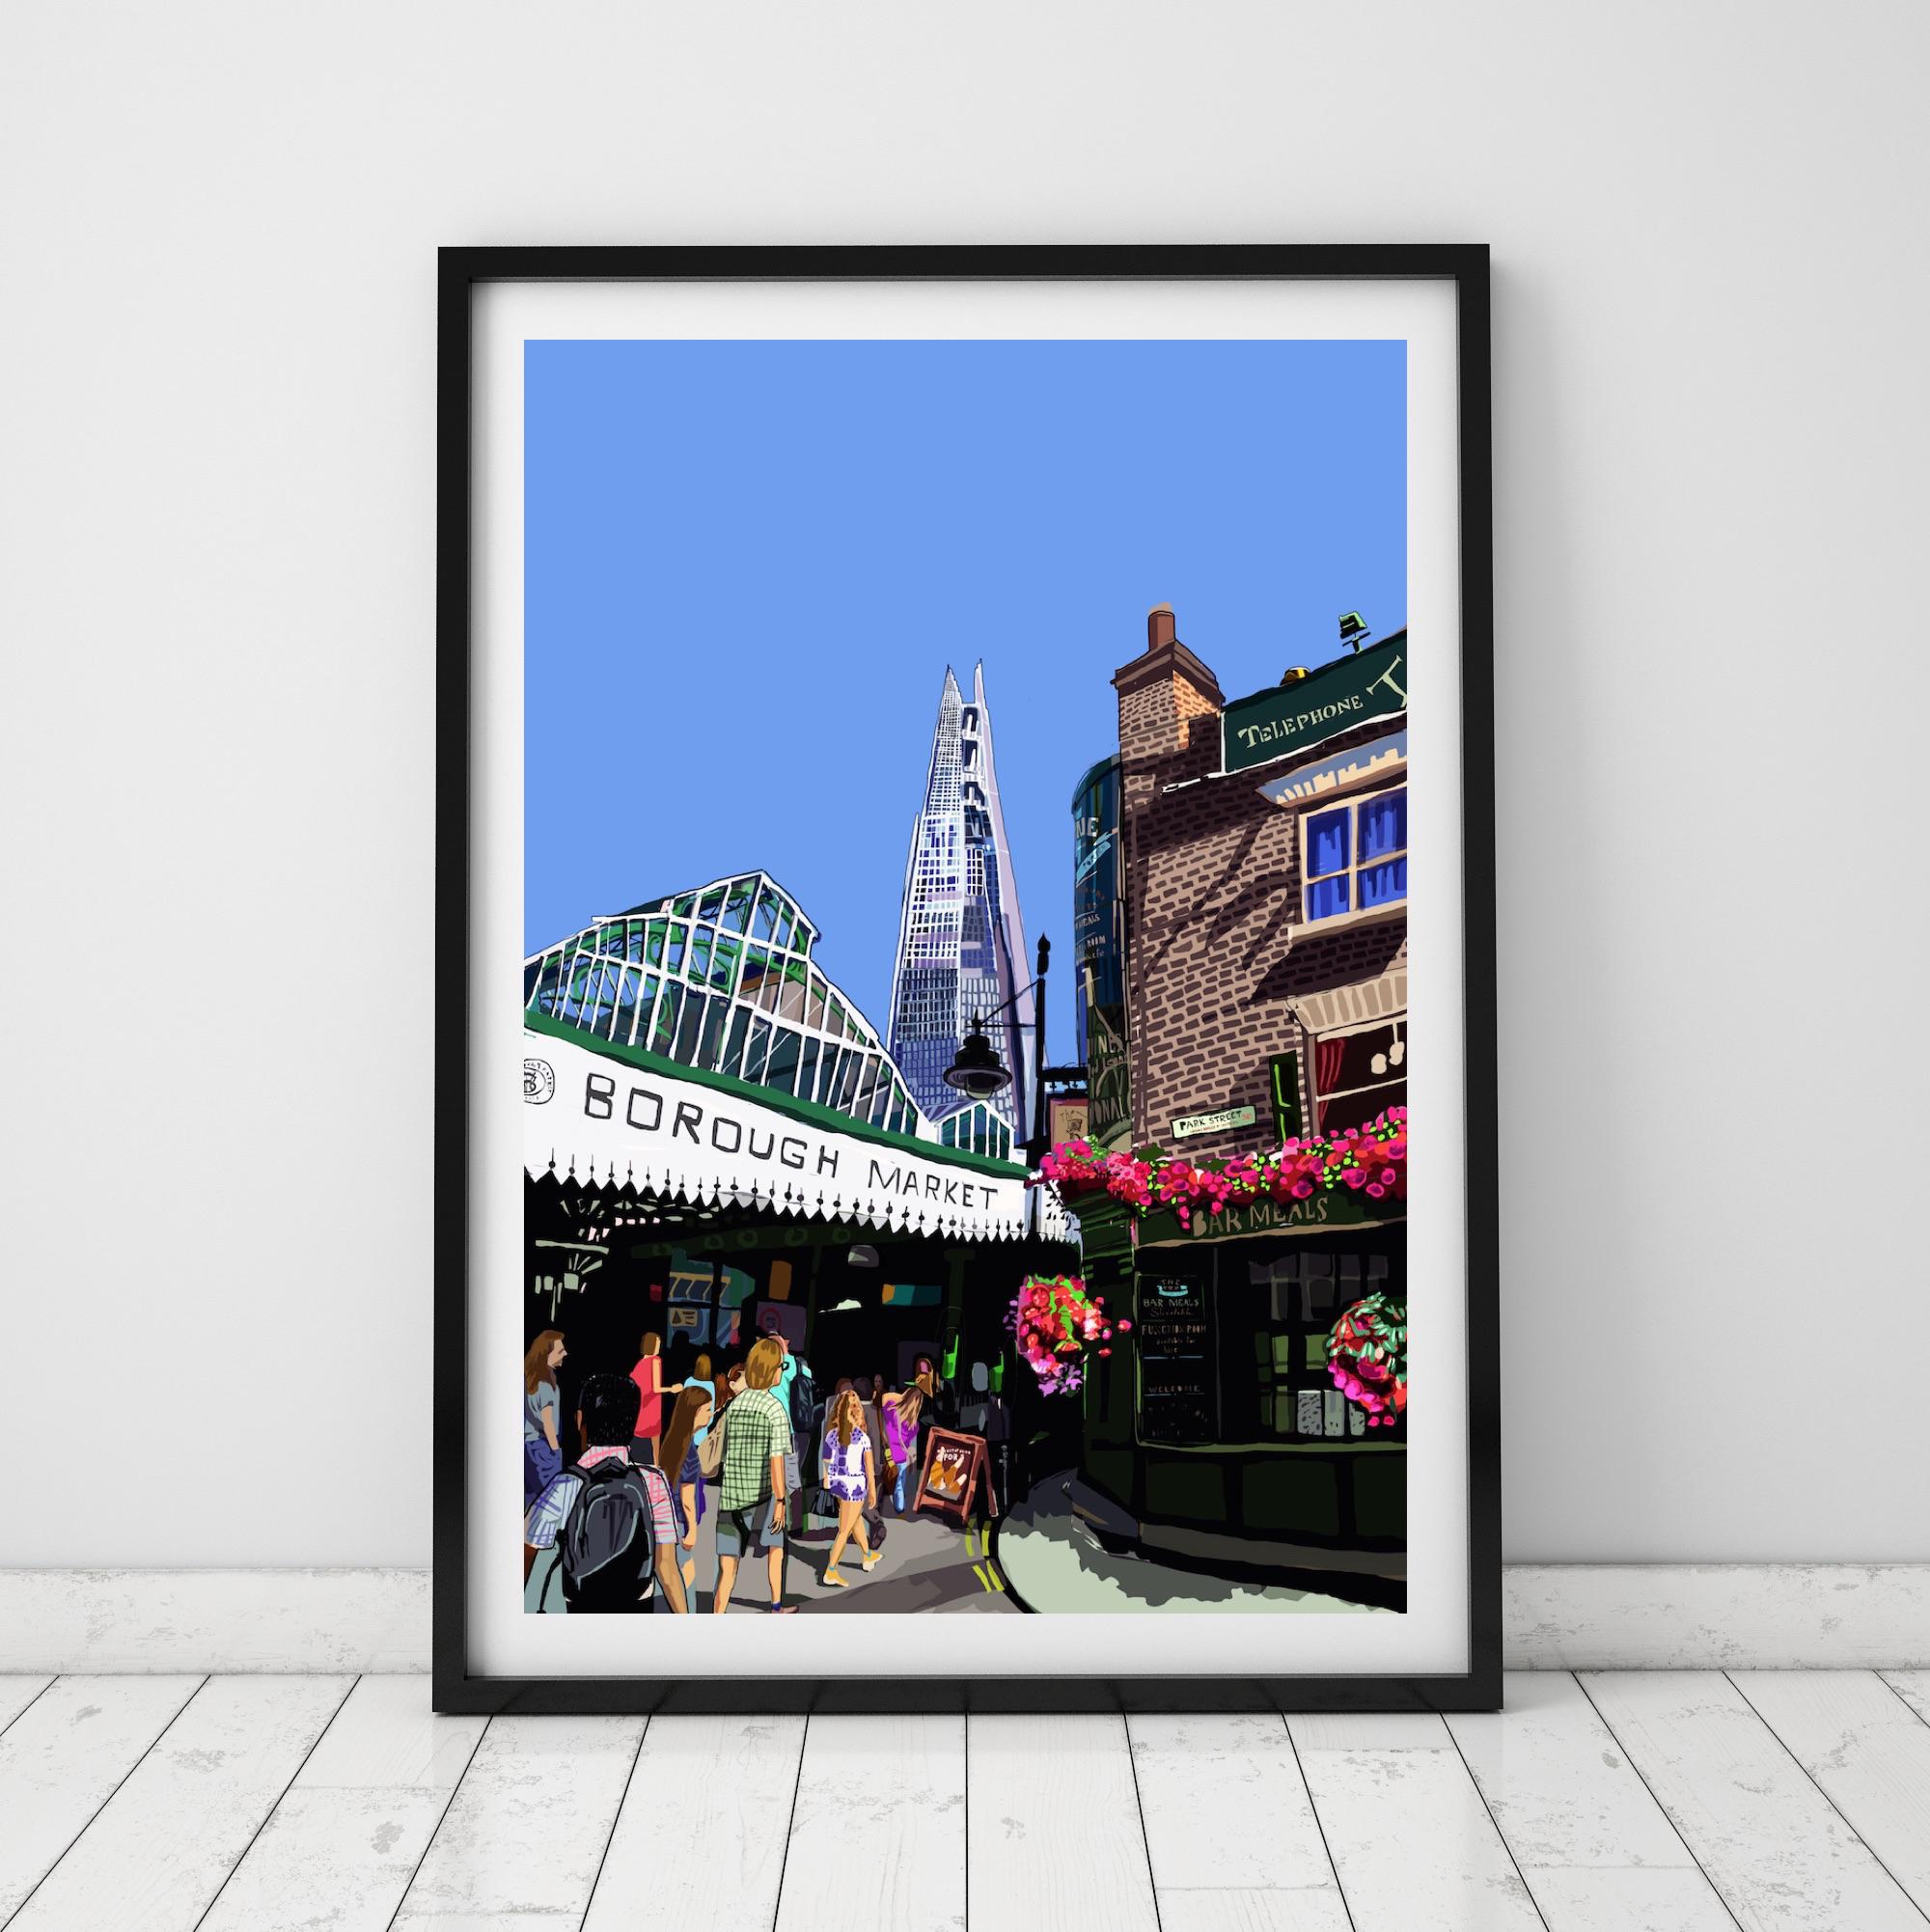 Borough Market (Black Frame Square)_.jpg